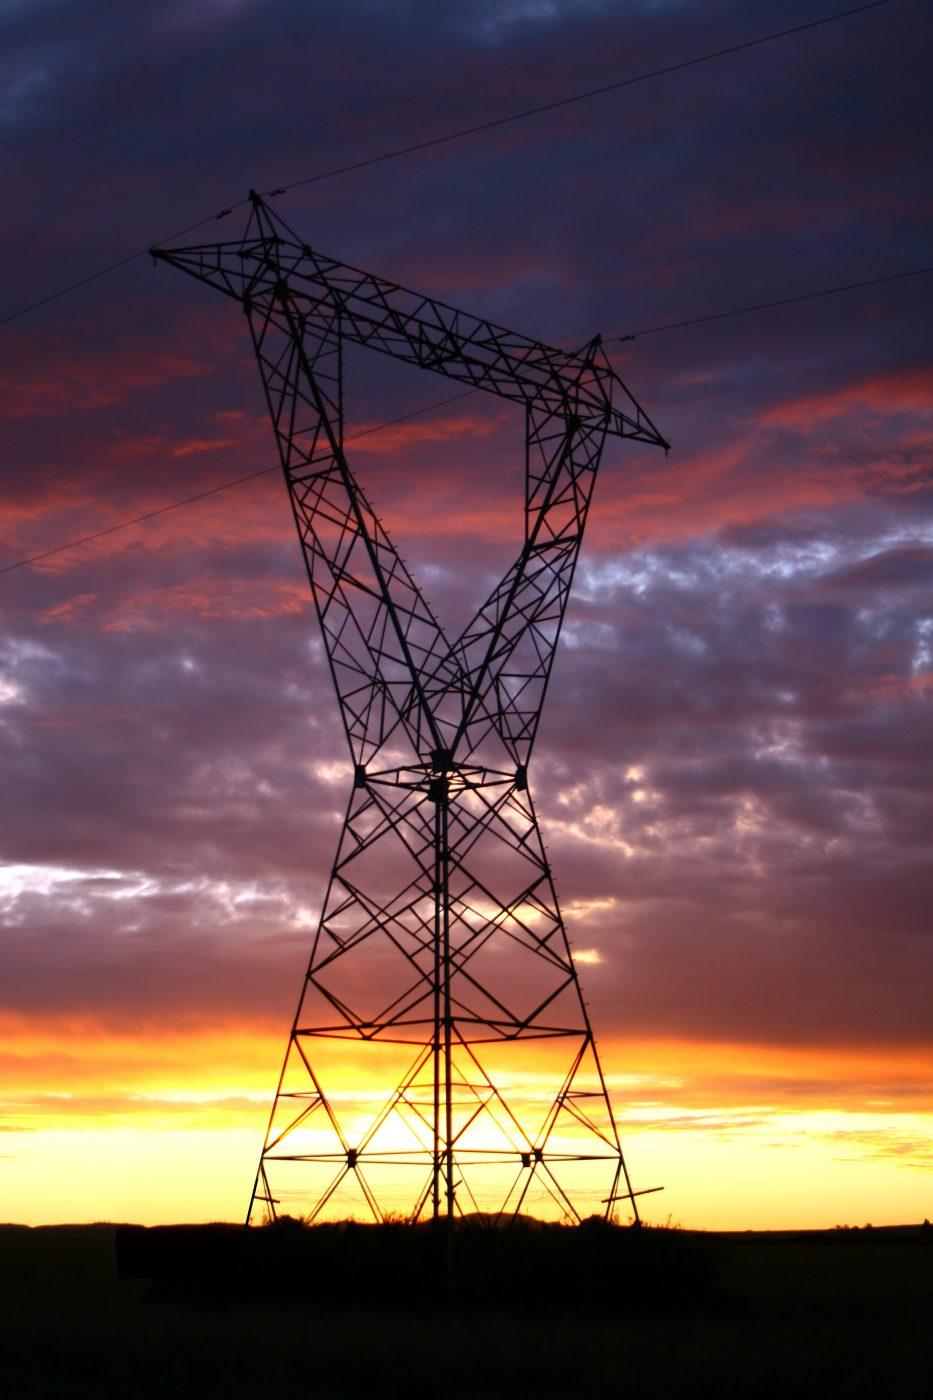 electric-sun-1439449 by Matthew Bowden